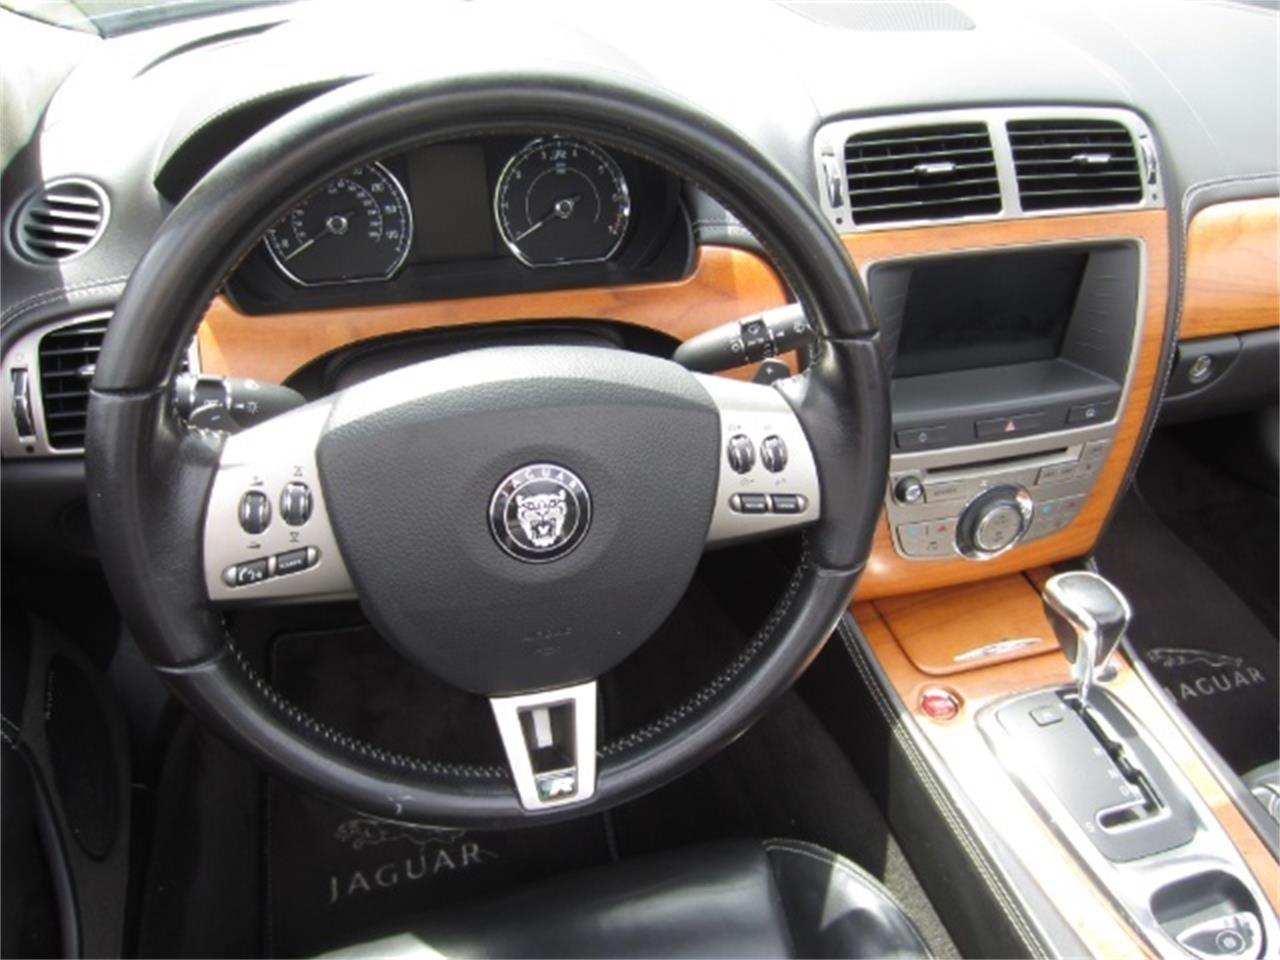 2008 Jaguar XKR (CC-1198774) for sale in Delray Beach, Florida